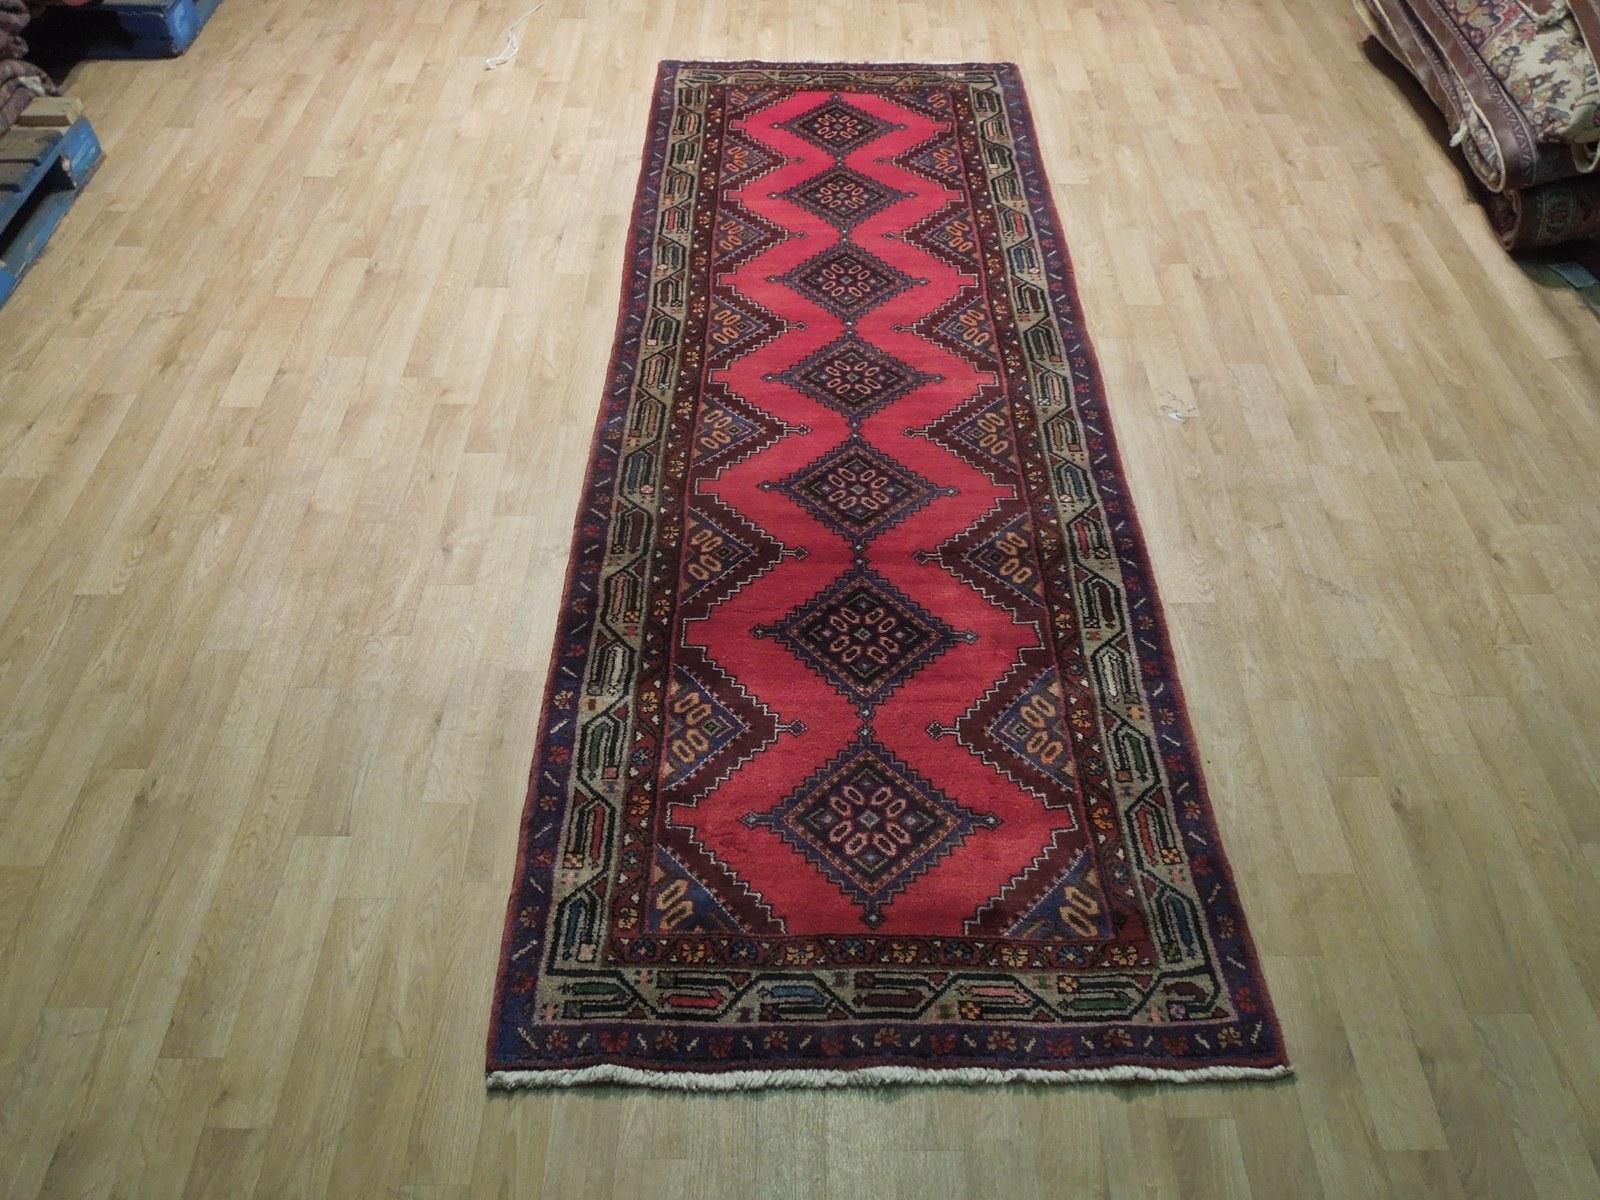 Pink Hamadan Persian Wool Handmade Rug 3x9 All-Over Geometric Rug image 4